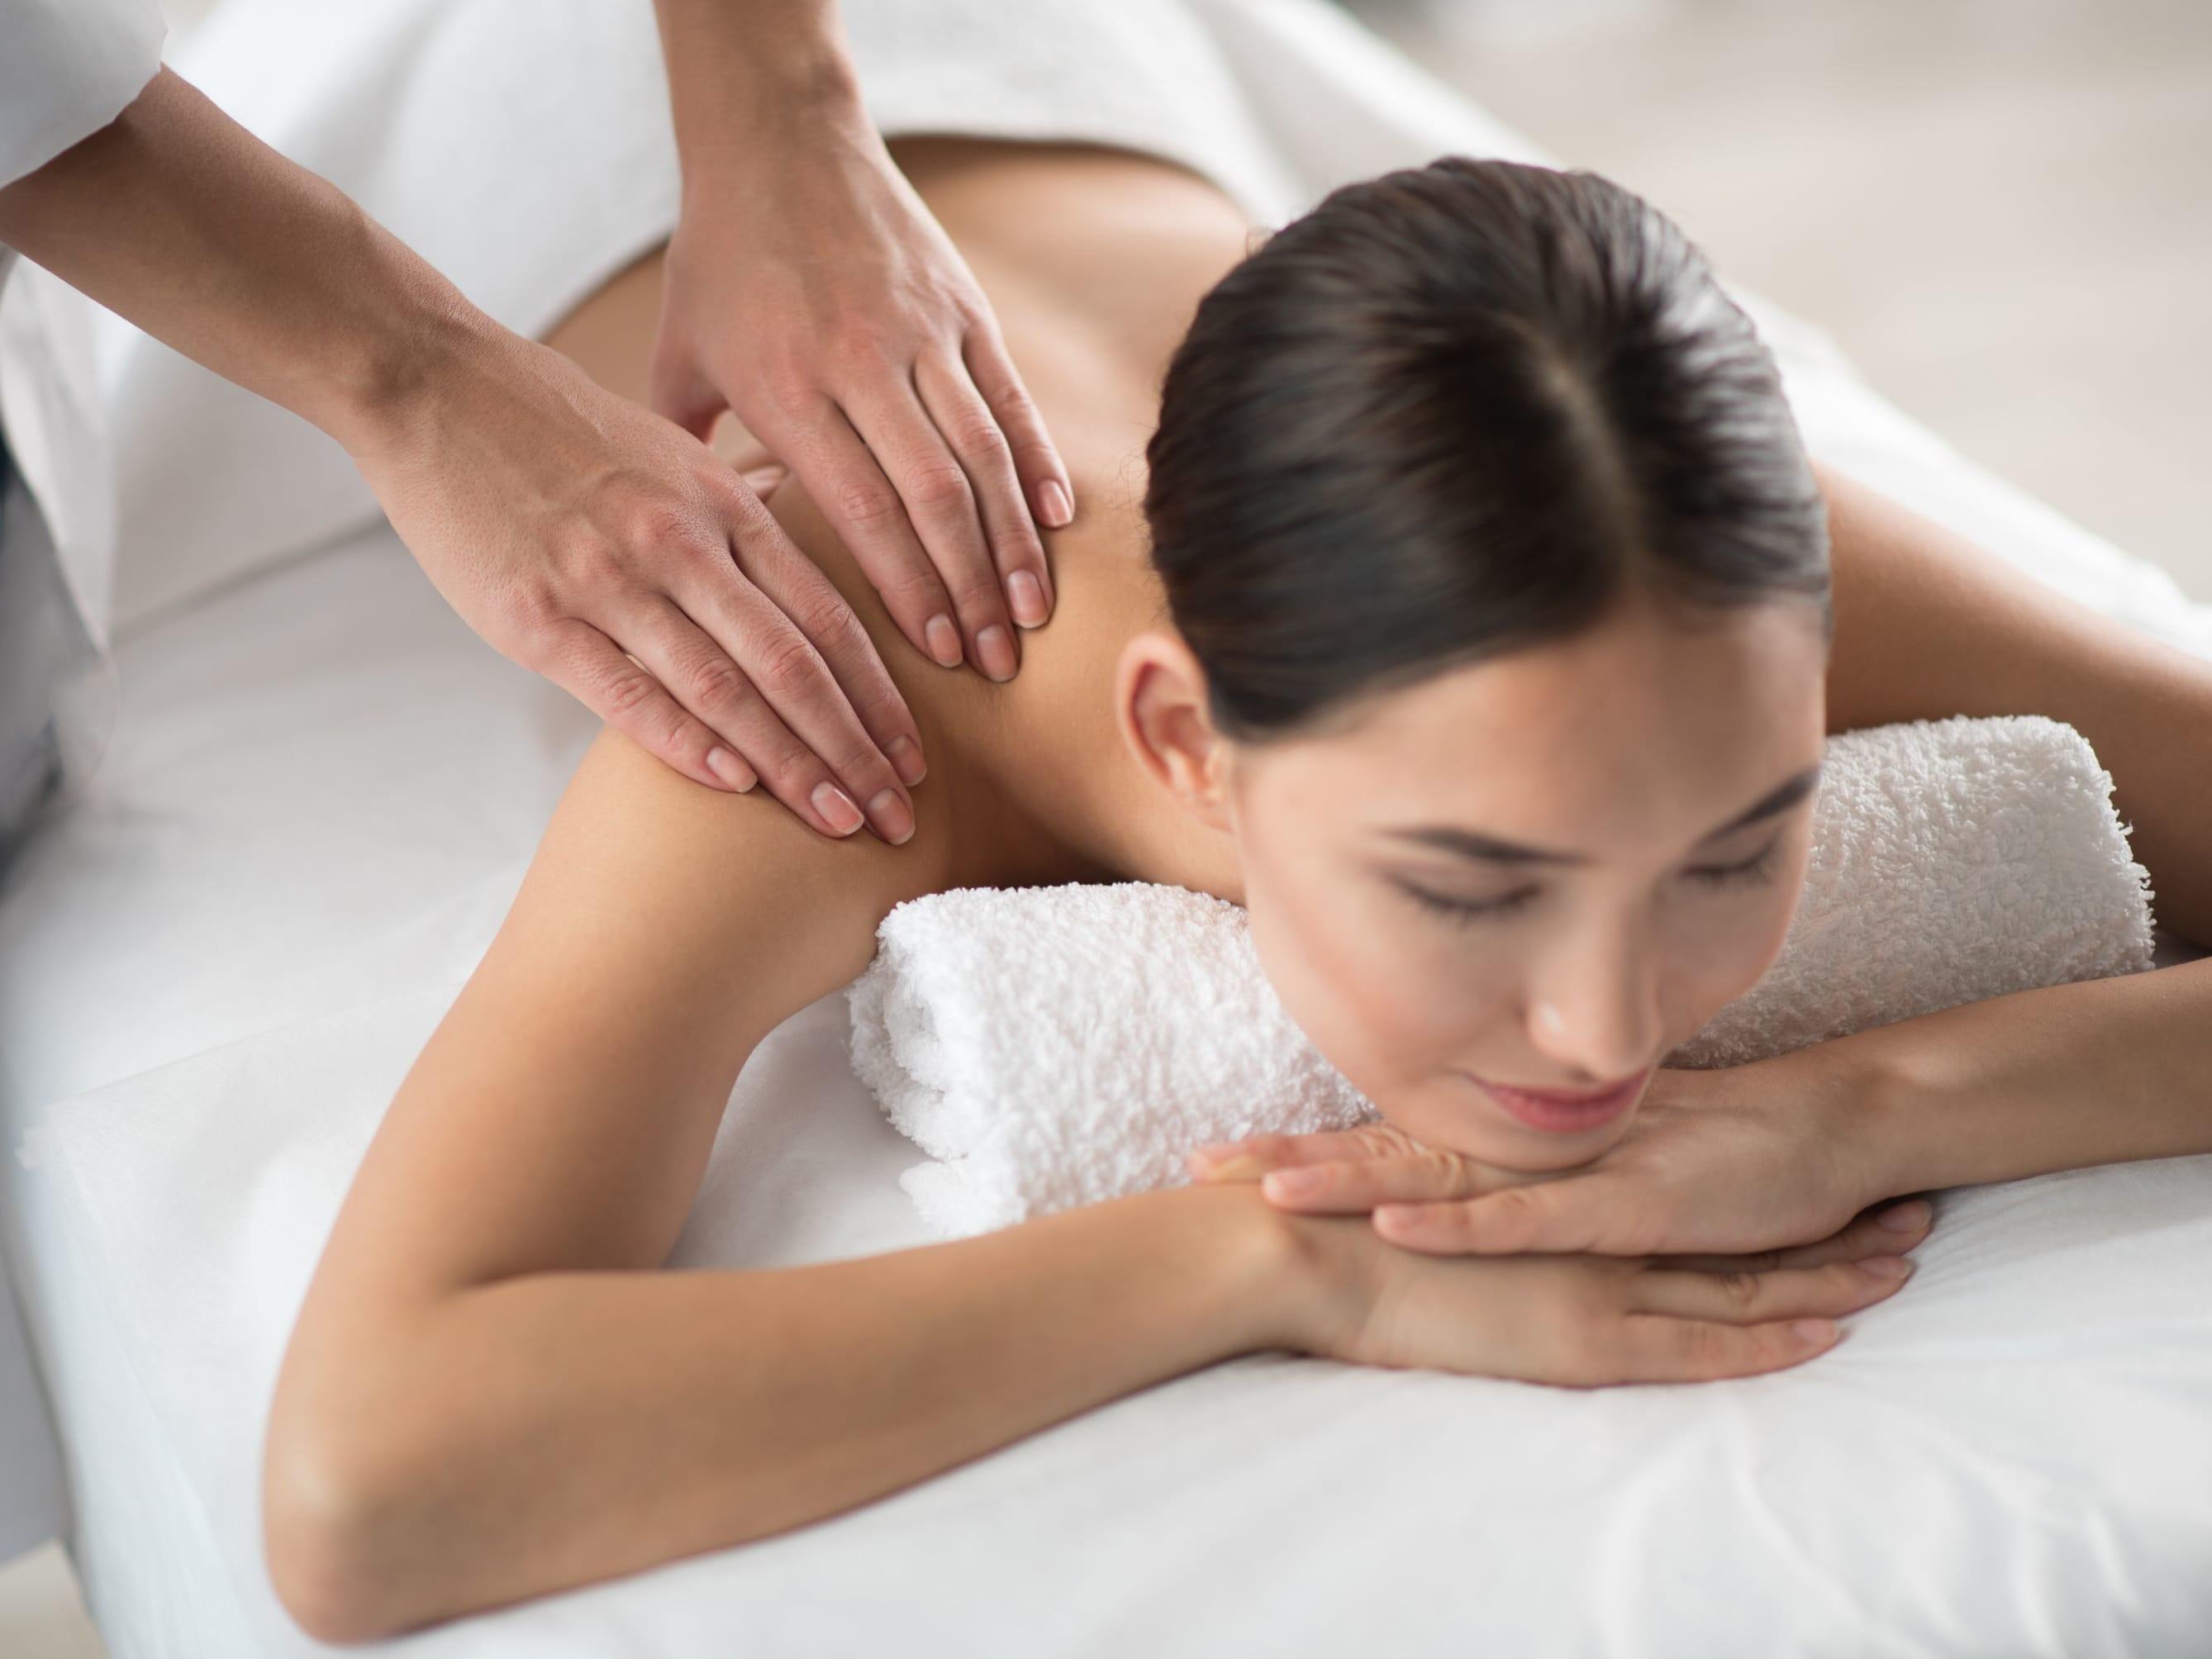 1.5-Hour Aroma Swedish Full Body Massage + Meridian Bo Jin Body Treatment for 2 People